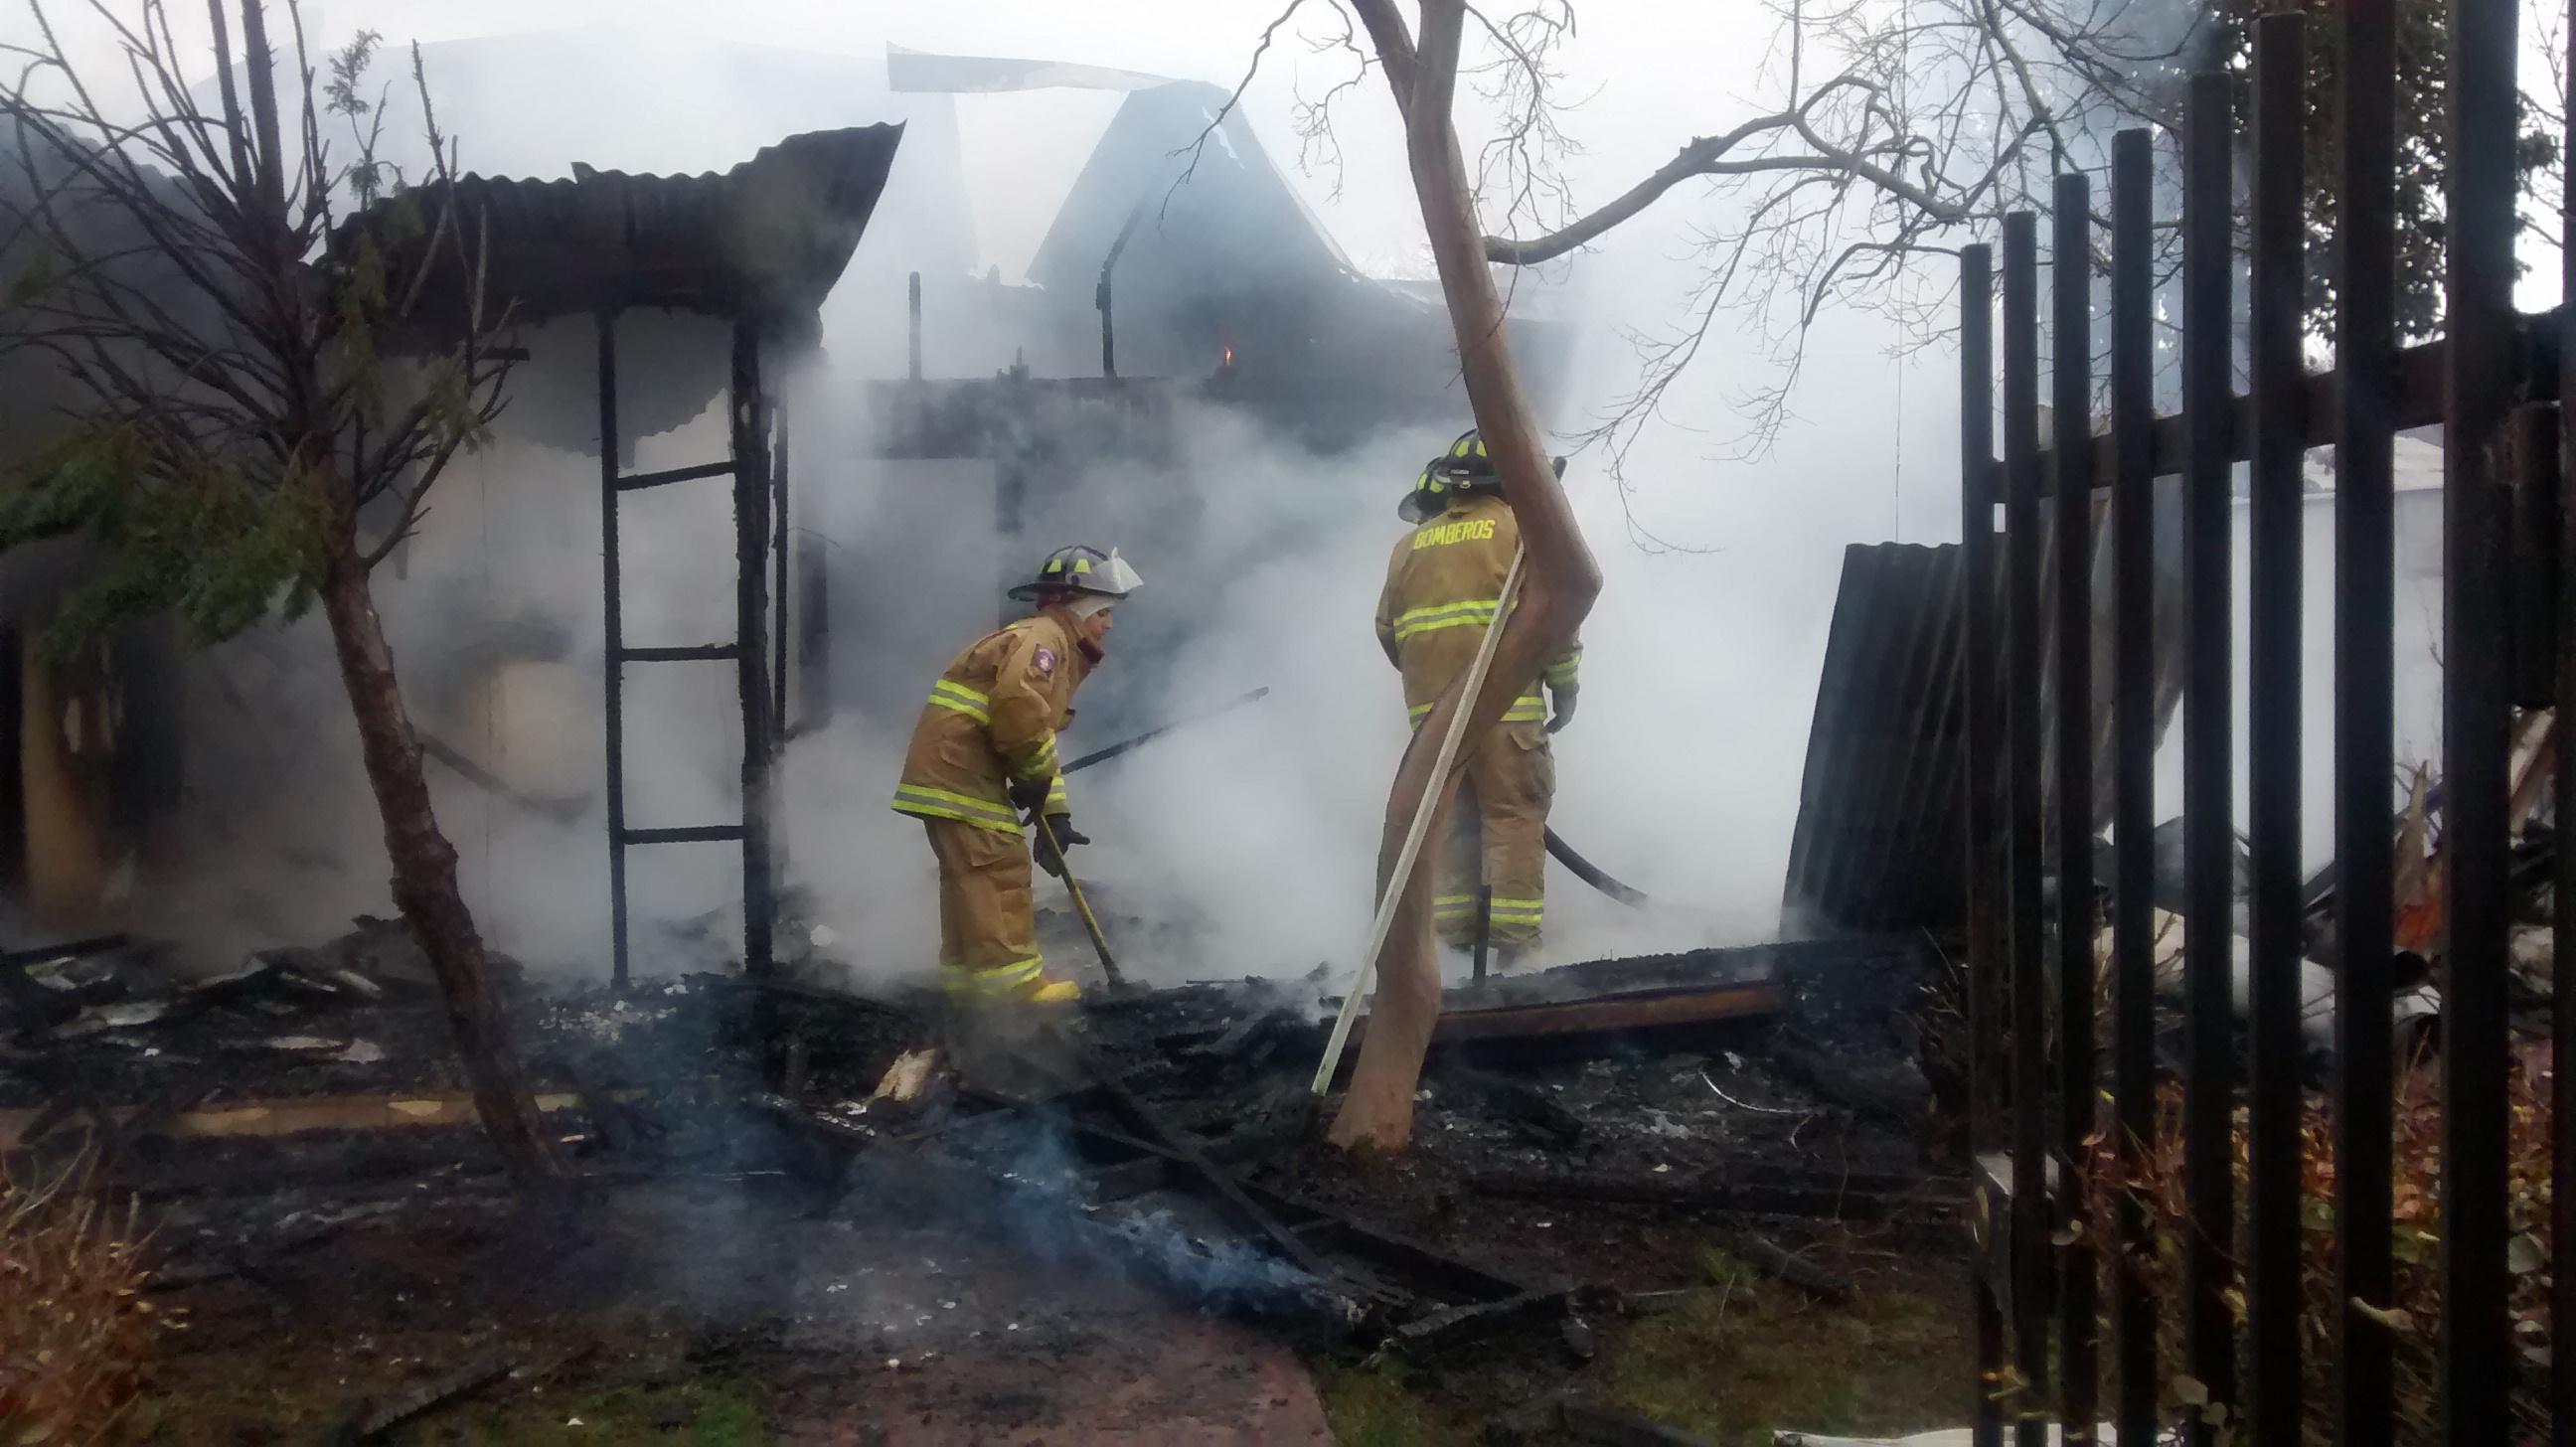 [Video] Violento incendio de vivienda deja un bombero herido en Talca